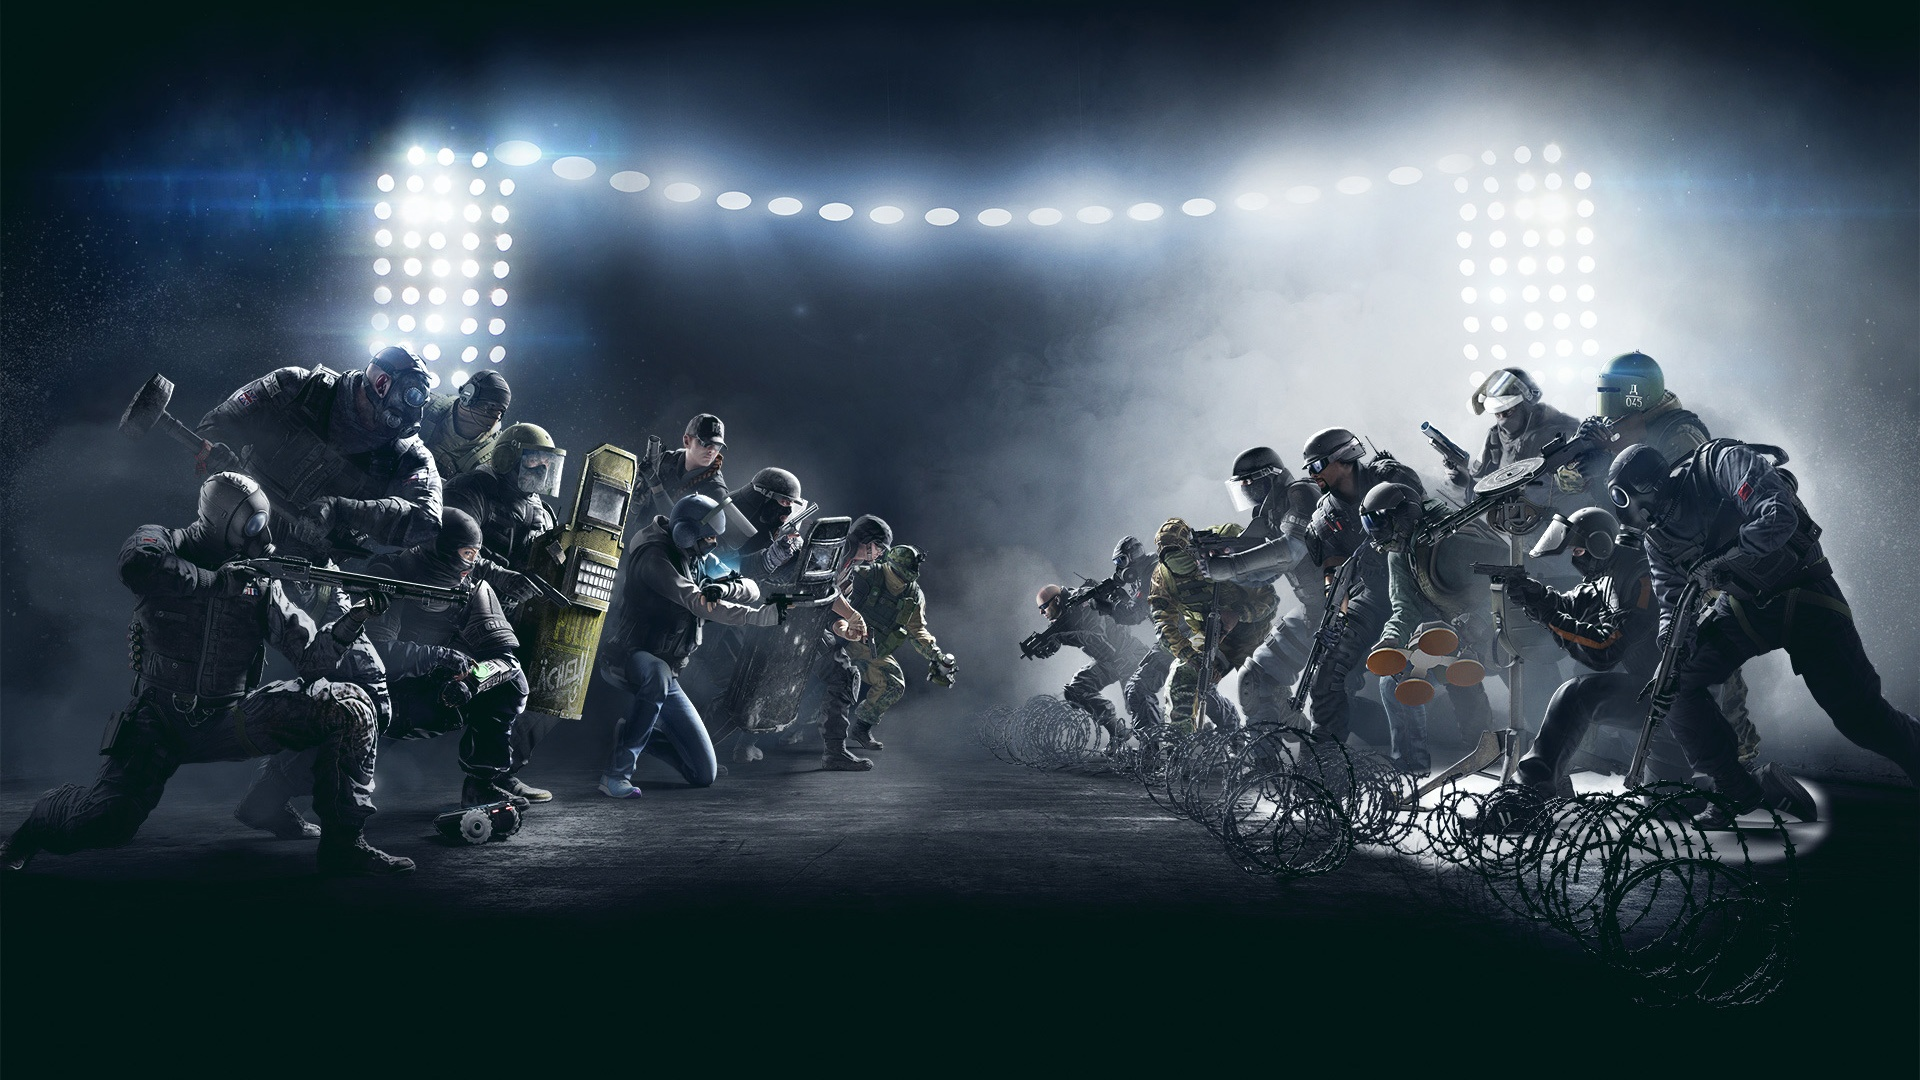 Rainbow-Six-Siege-Game-HD-Wallpaper-4K-676369.jpg